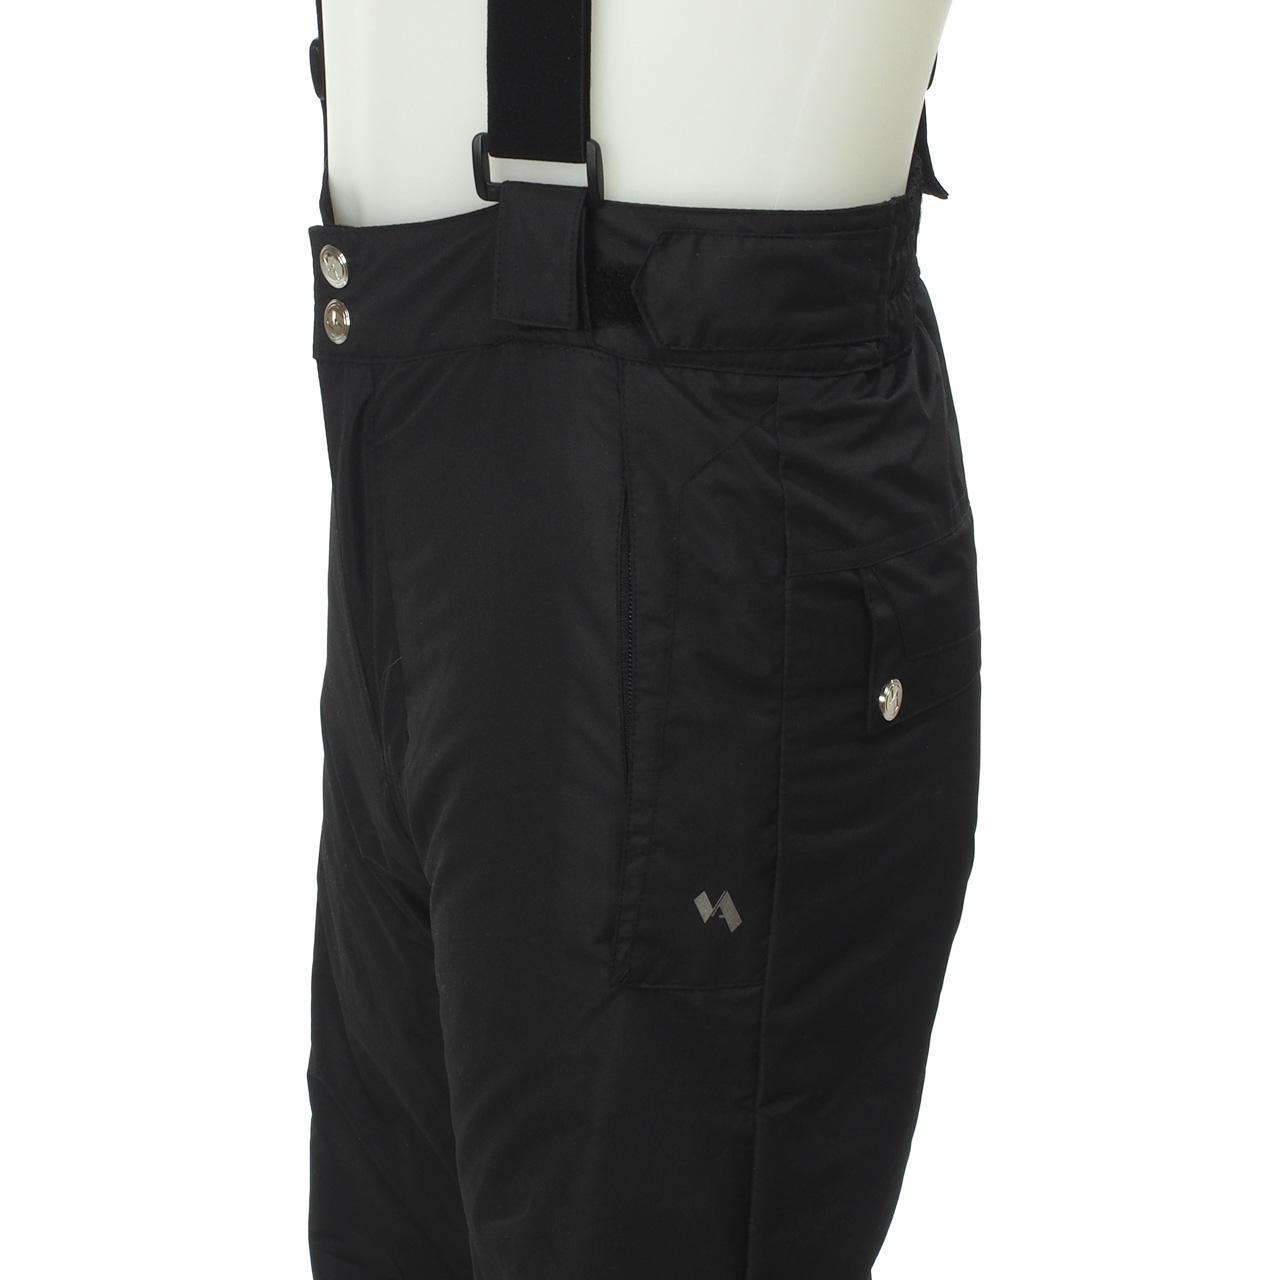 Pantalon-de-ski-surf-Alpes-vertigo-Testy-noir-pant-ski-jr-Noir-14604-Neuf miniature 2